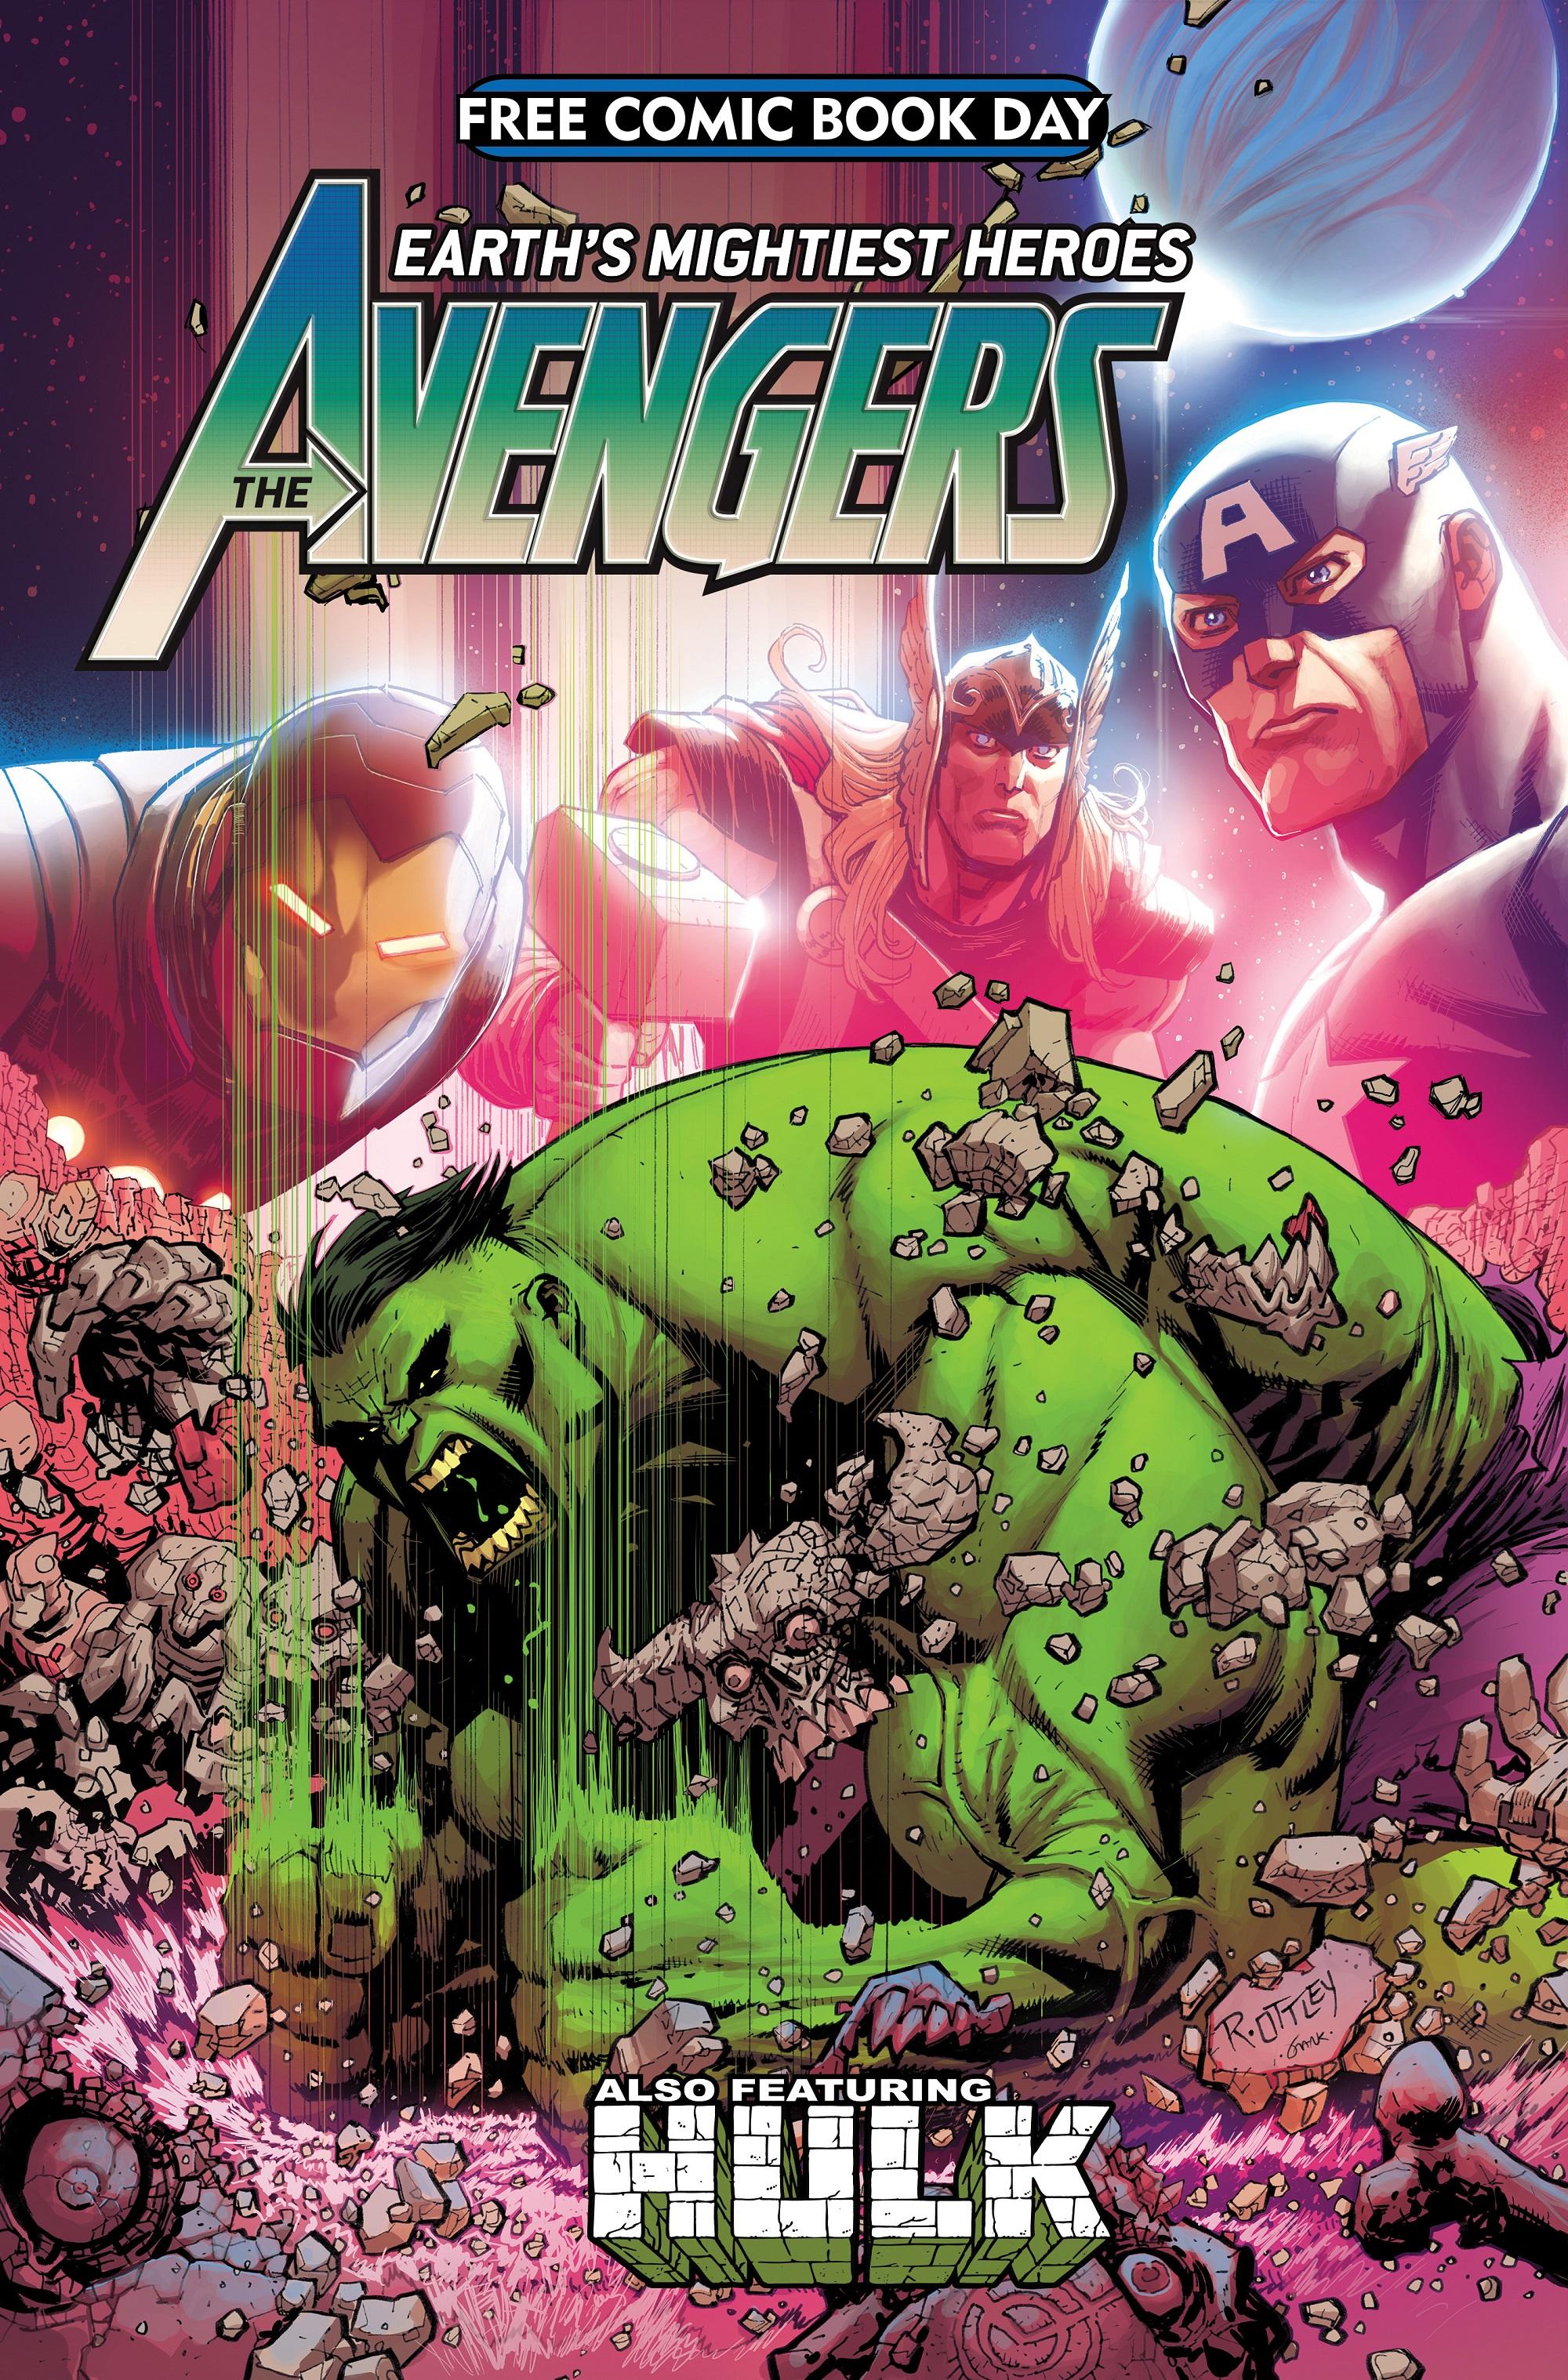 Free Comic Book Day: Avengers/Hulk (2021) #1